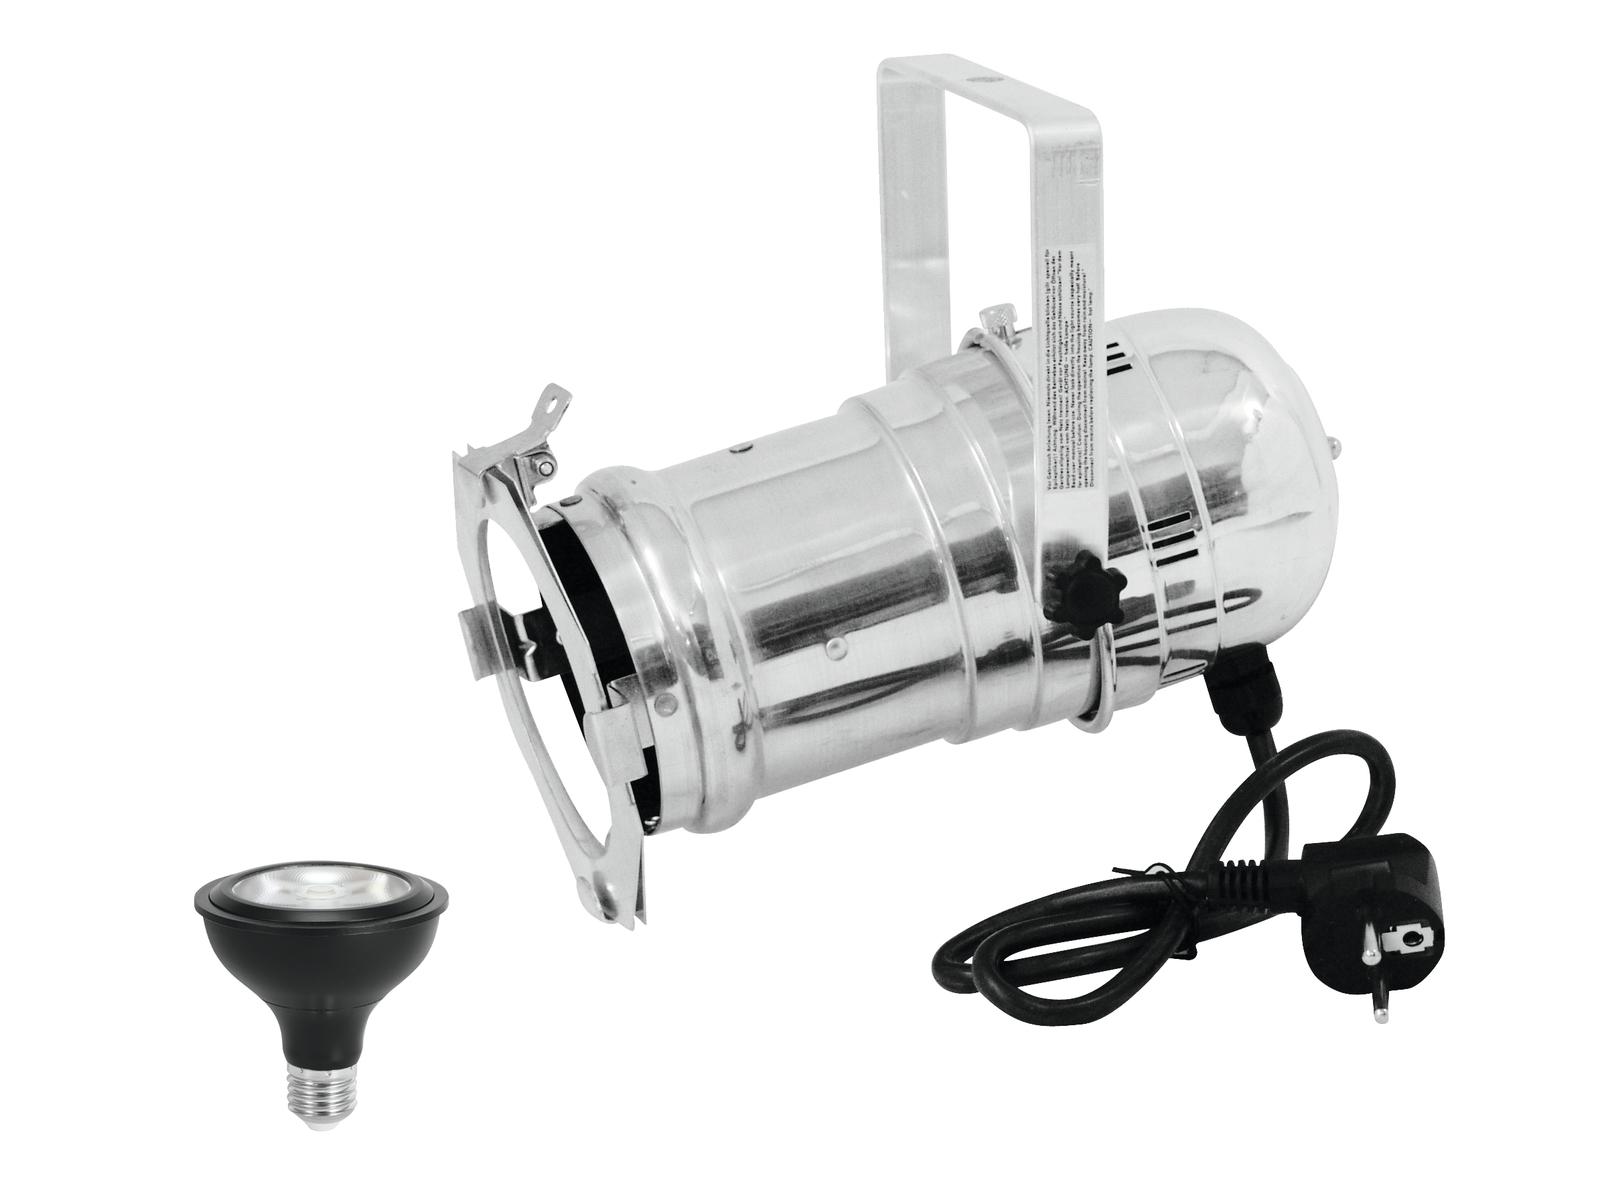 EUROLITE Set PAR-30 Spot sil+ PAR-30 230V COB 12W E-27 LED 1800-3000K dim2warm